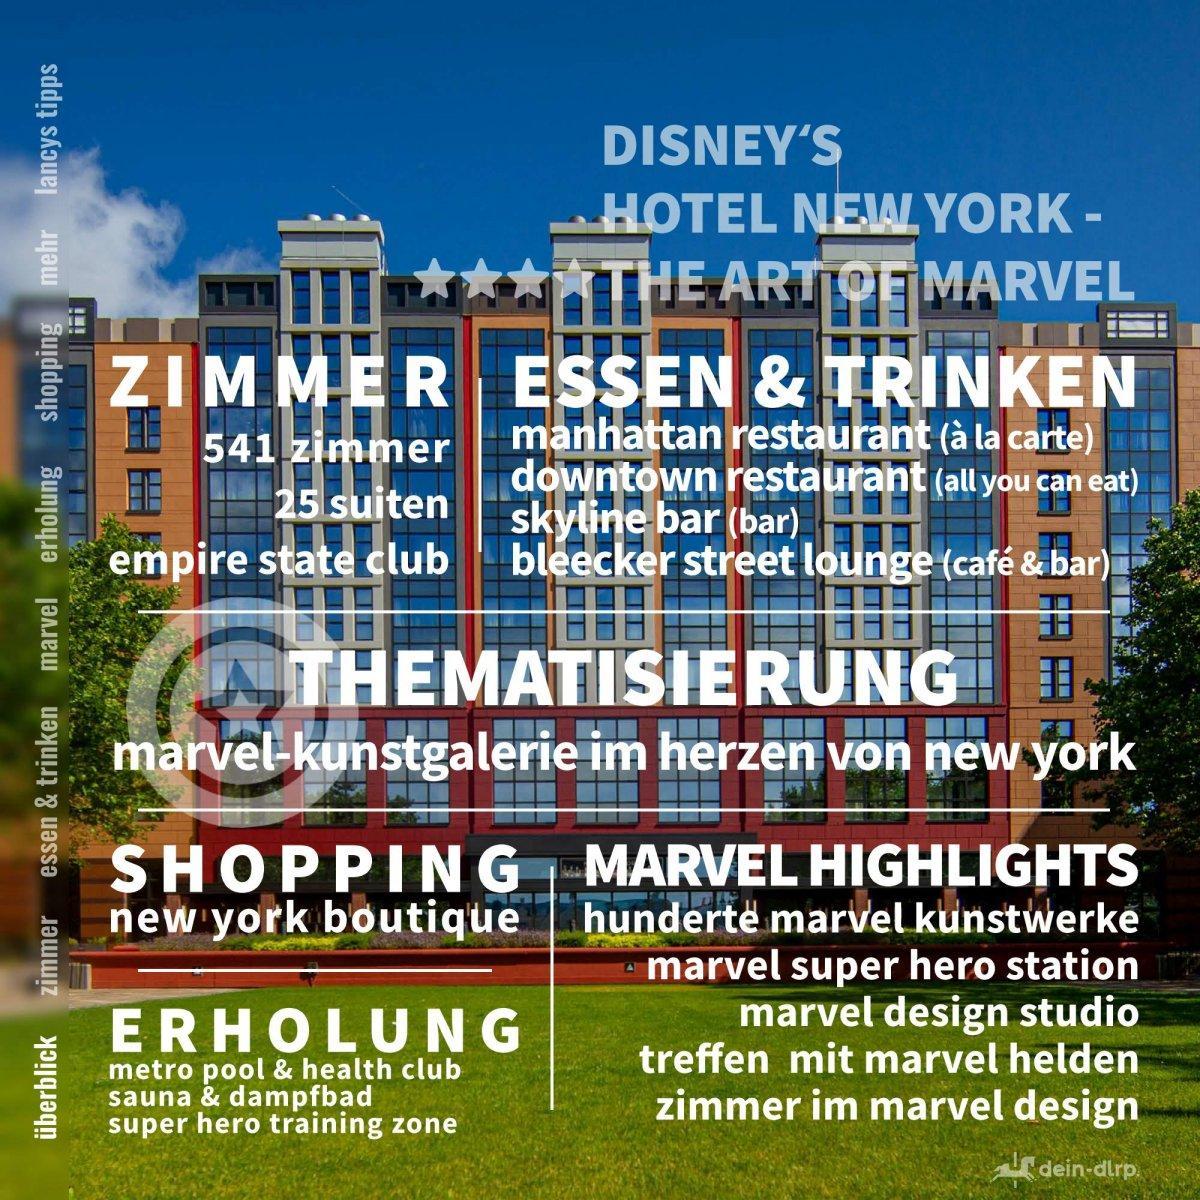 disneys-hotel-new-york-the-art-of-hotel-fuehrer_02.jpg